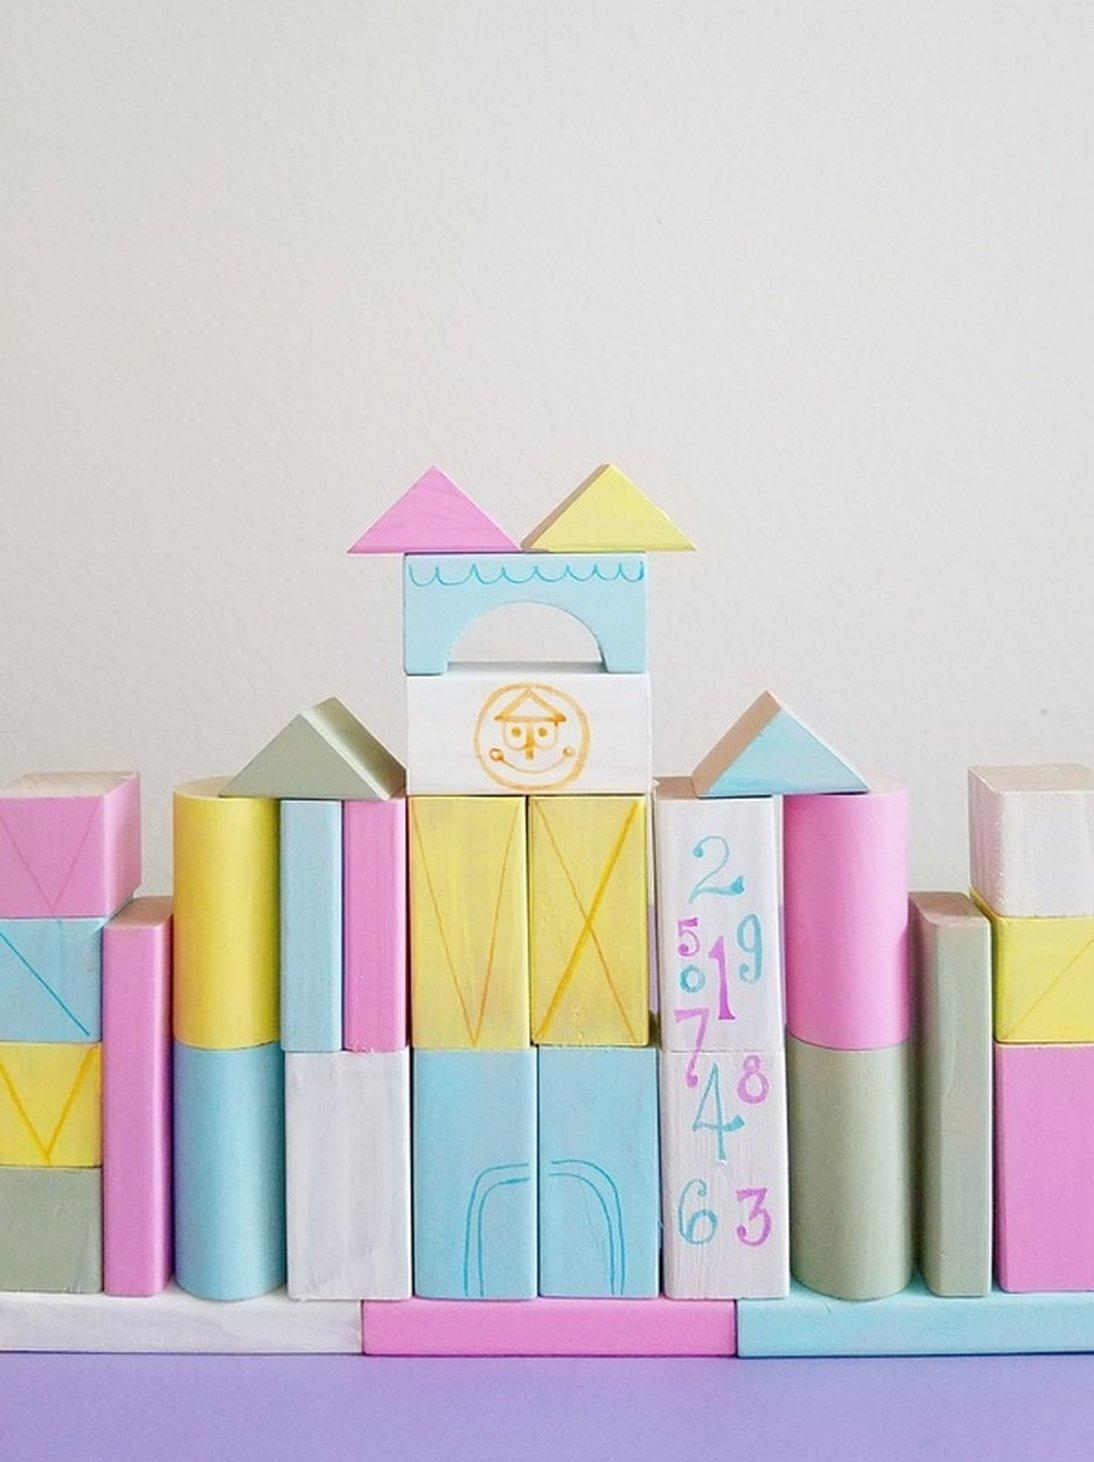 Cute 4th Of July Wallpaper Diy It S A Small World Wooden Blocks A Waltz Through Disney